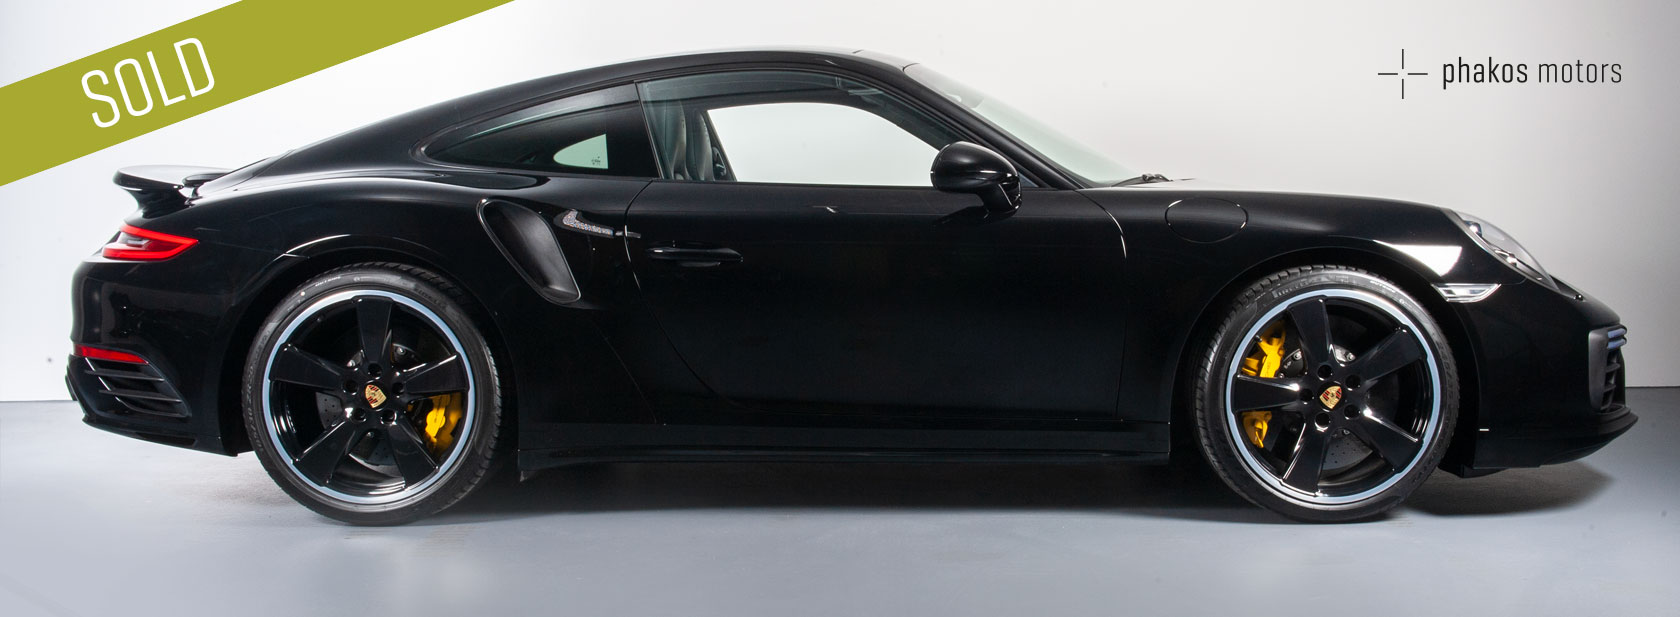 Porsche 911 Turbo S – SOLD